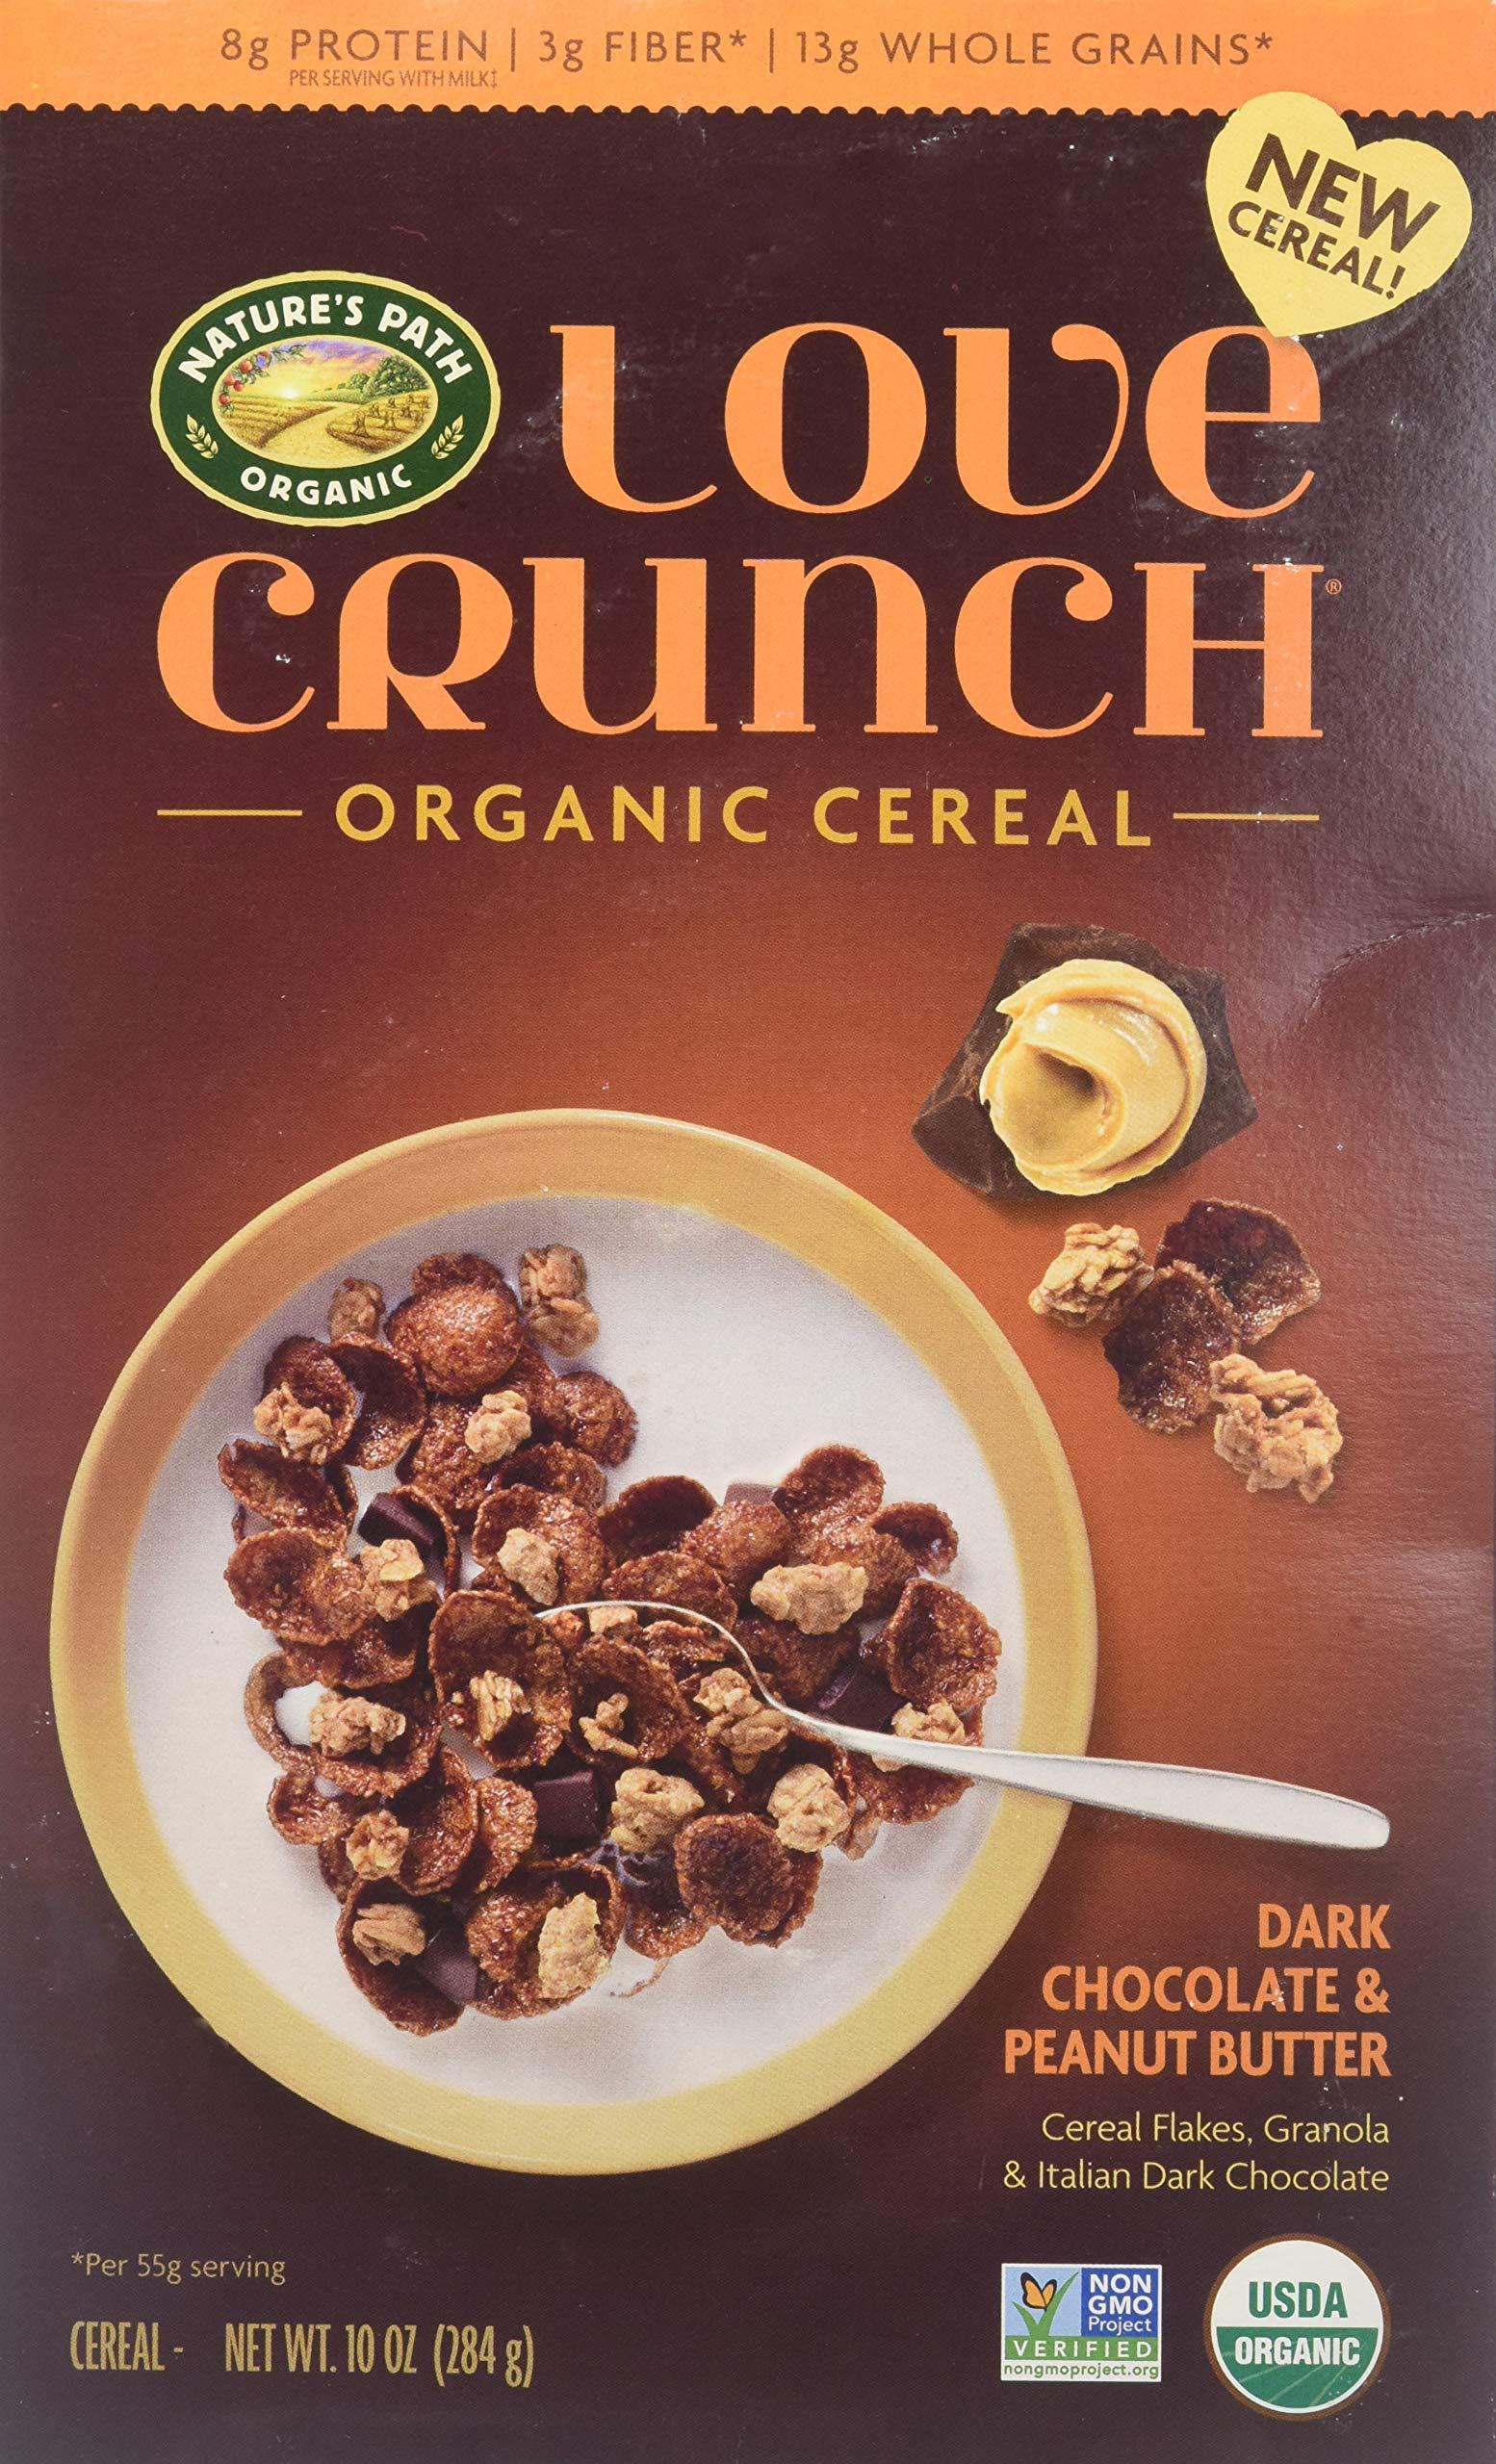 Nature S Path Organic Love Crunch Organic Cereal Dark Chocolate Peanut Butter 10 Oz Buy Online In Mongolia At Mongolia Desertcart Com Productid 93167783